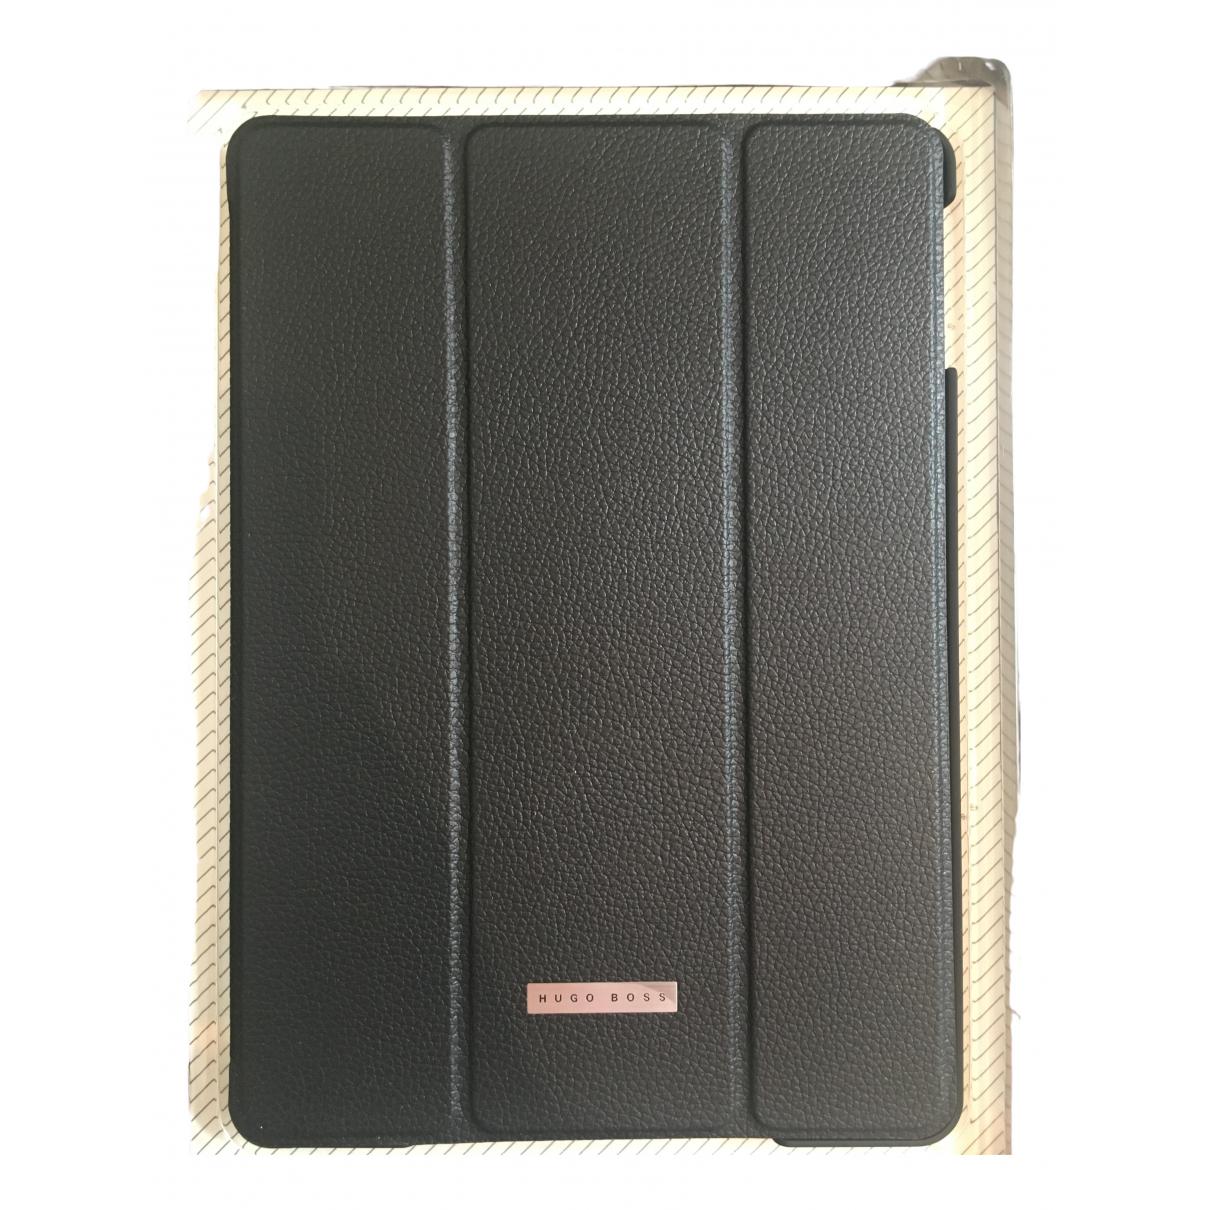 Hugo Boss \N Black Leather Small bag, wallet & cases for Men \N